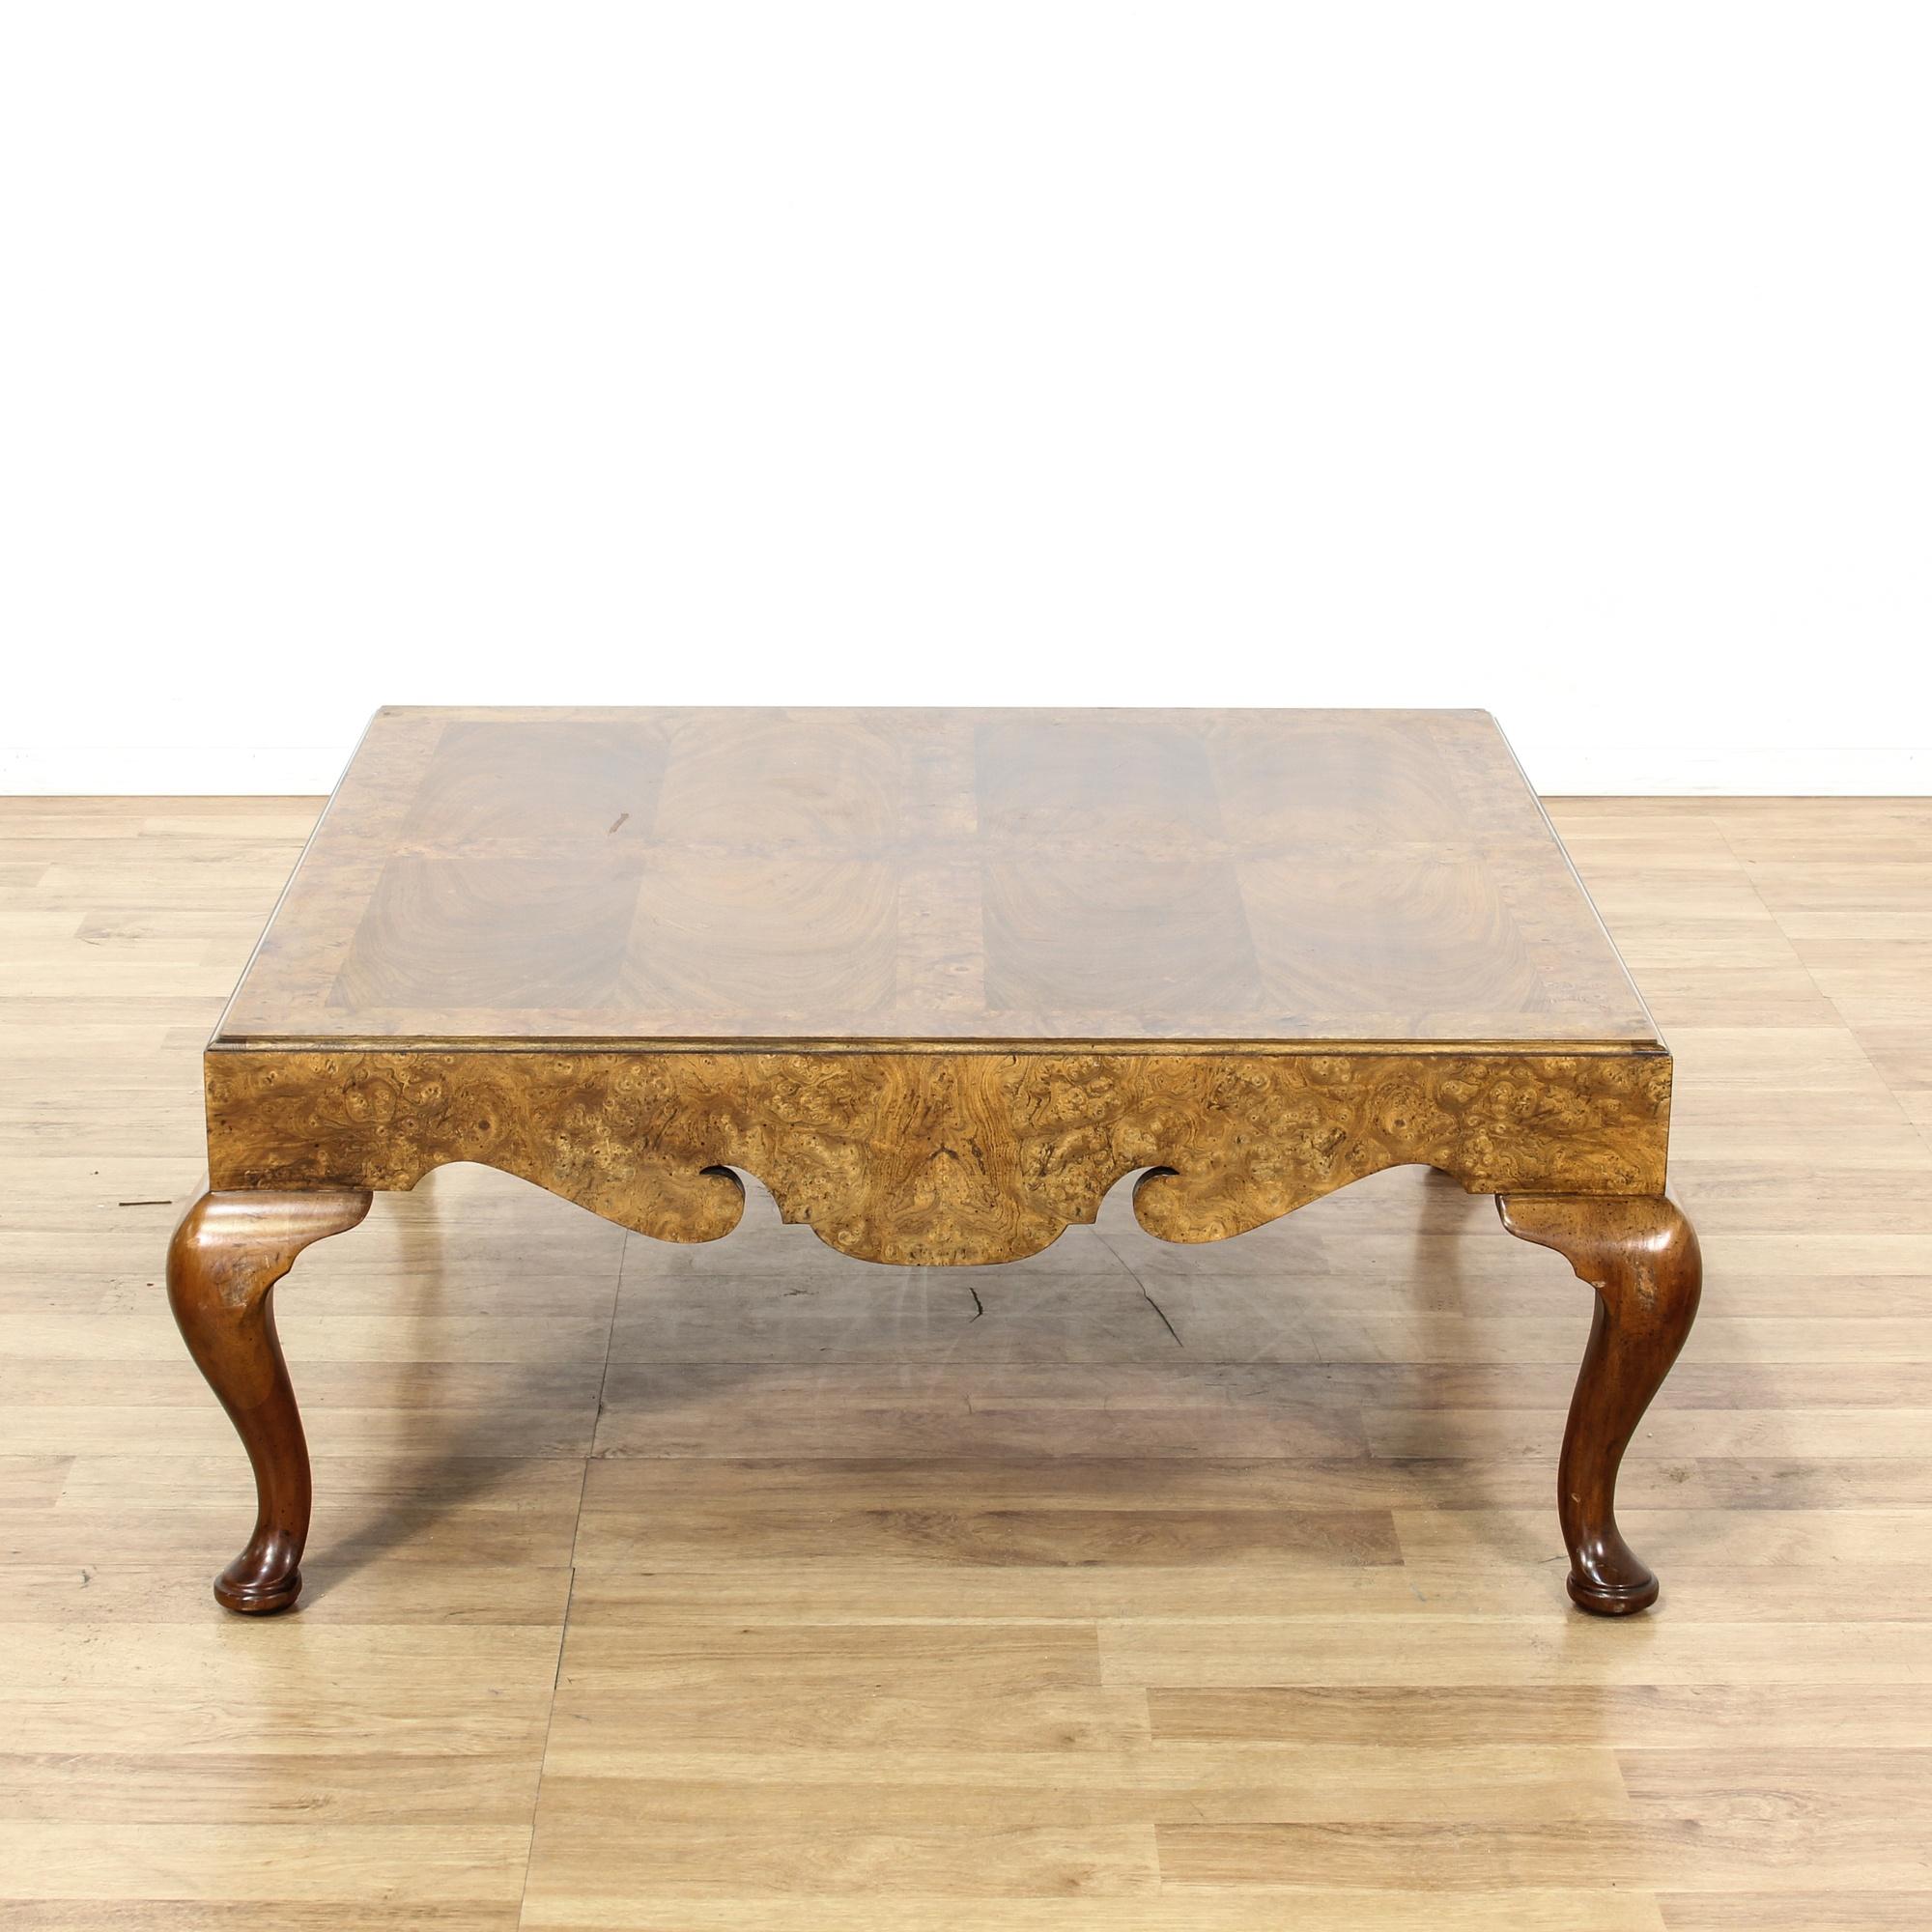 Burl Coffee Table Legs: Large Square Burl Wood Coffee Table